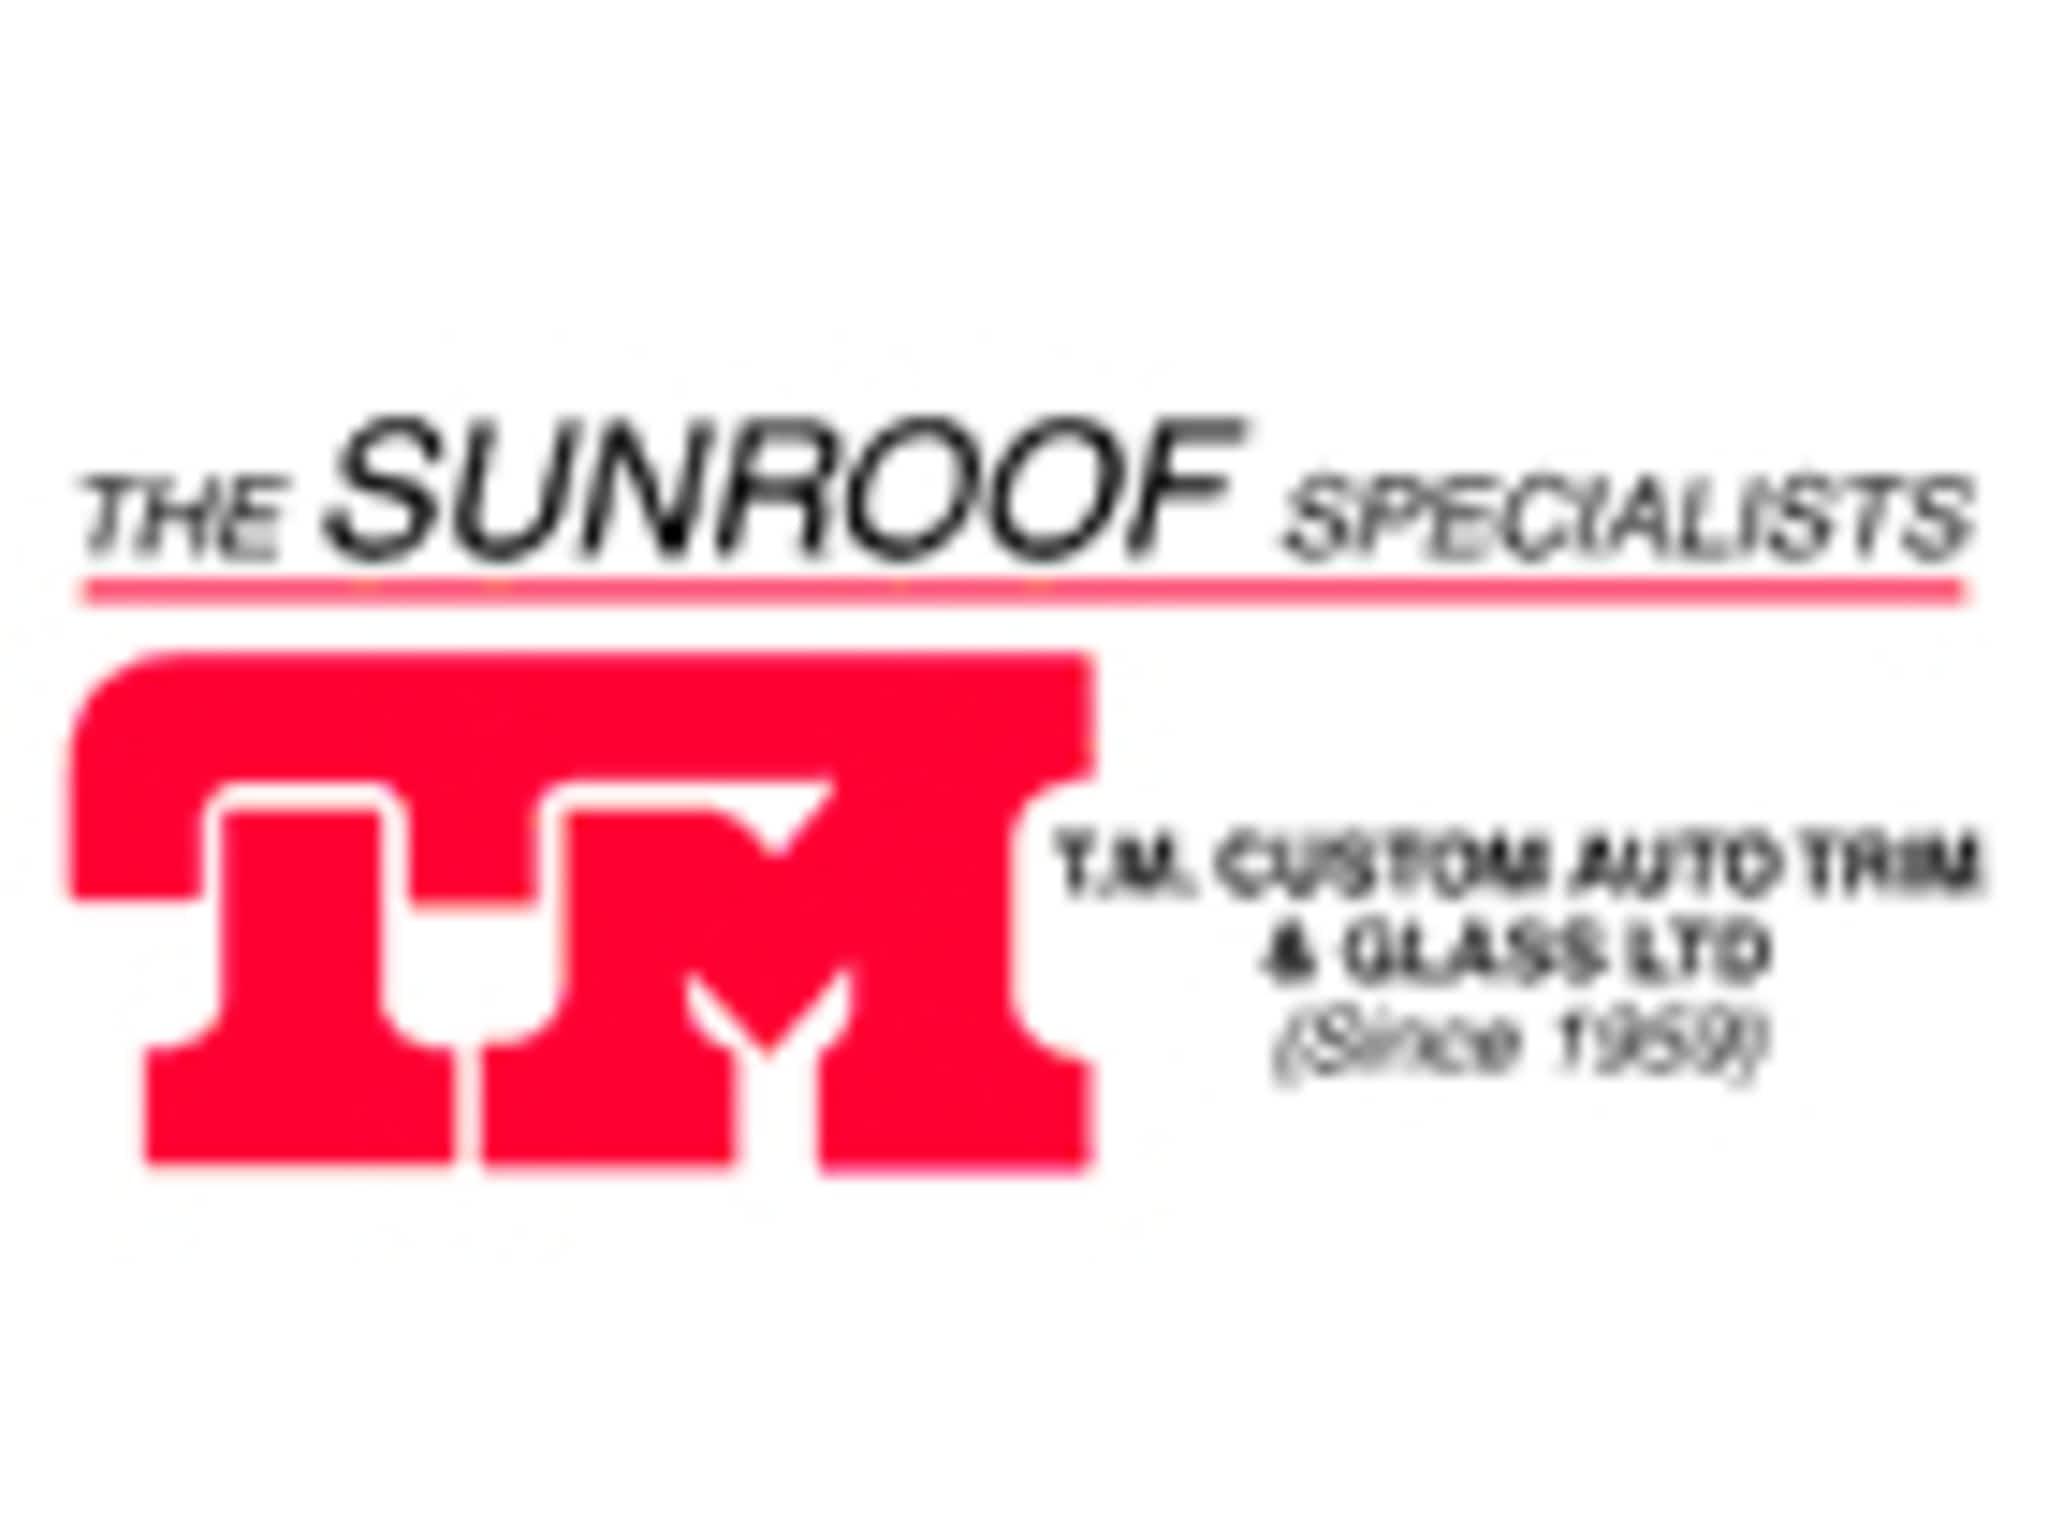 photo TM Custom Auto Trim & Glass Limited - Est. 1958 The Sunroof Specialists